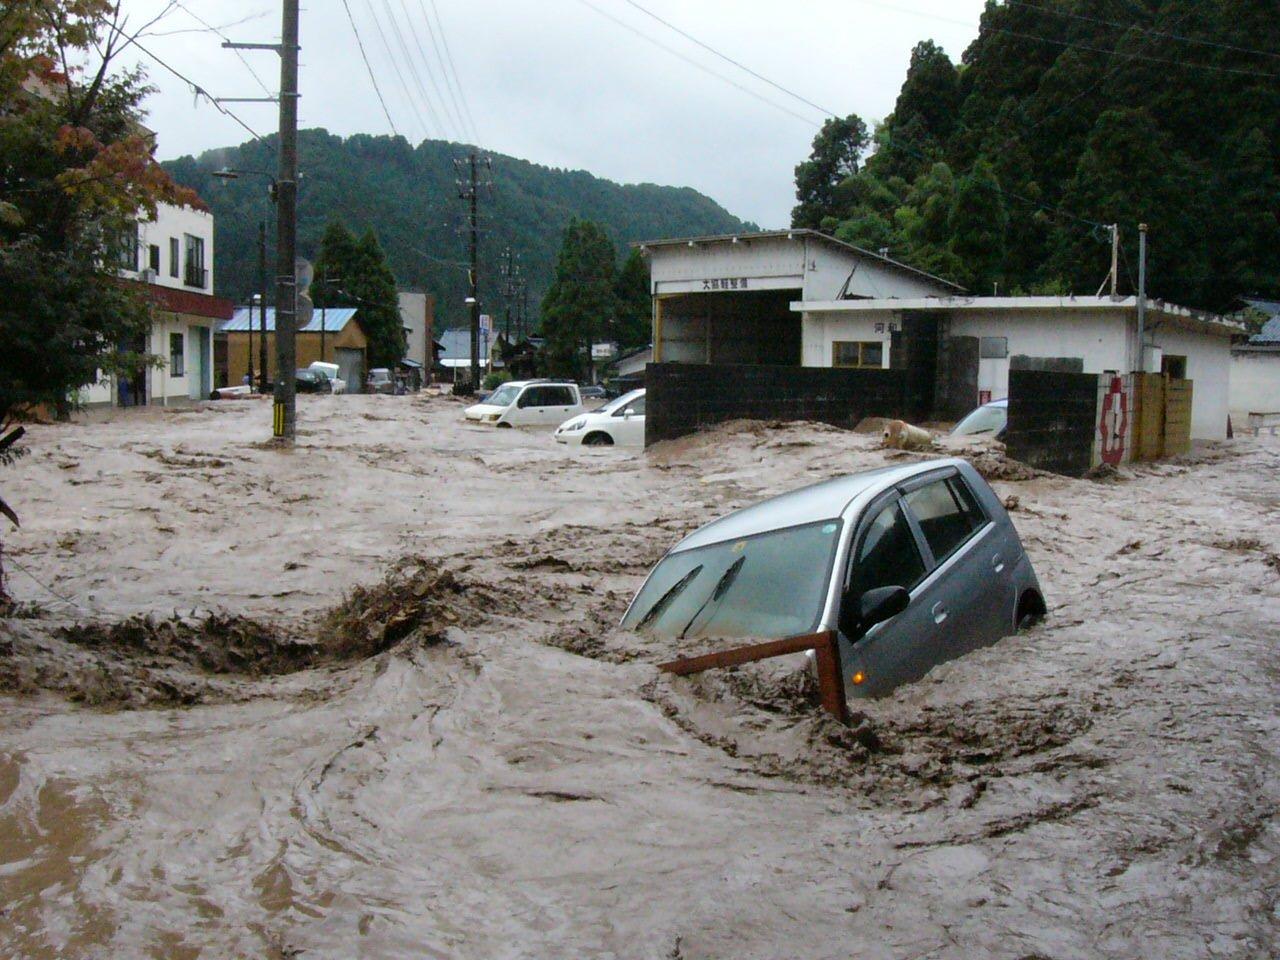 img 5a5060a7de9f1.png?resize=300,169 - 中国で大洪水!救出される豚さんの画像が可愛いとTwitterで話題